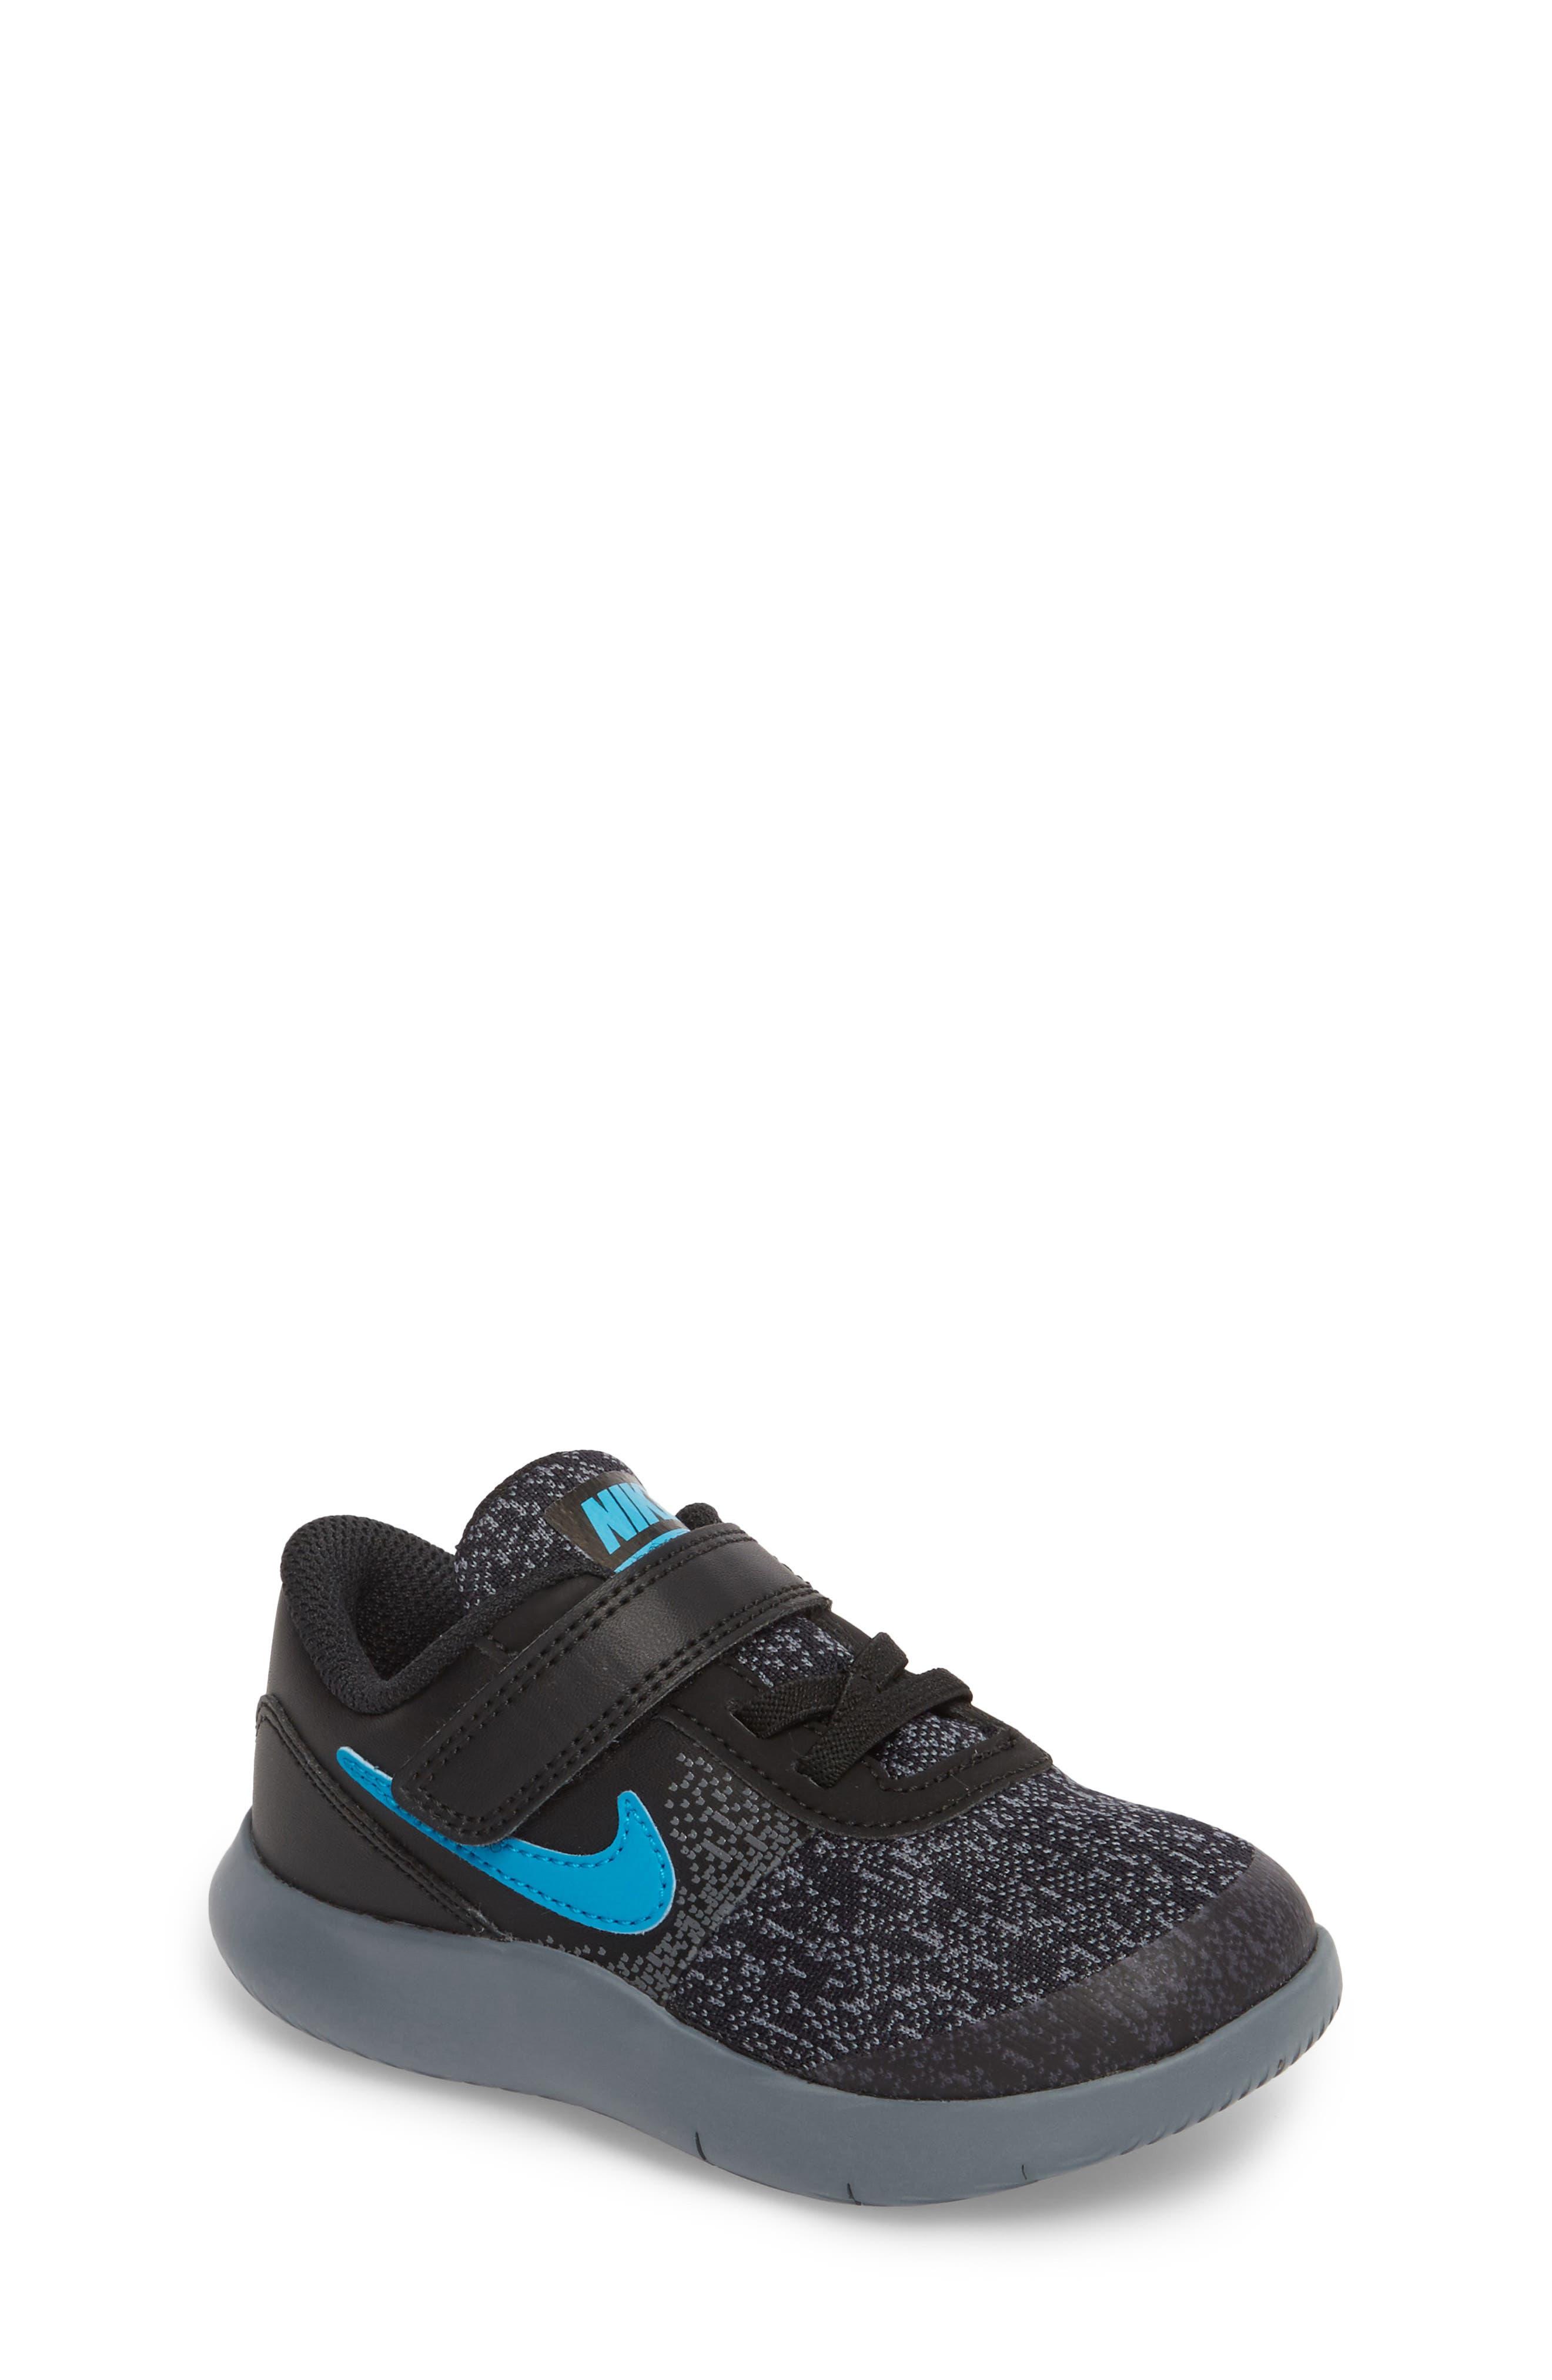 Main Image - Nike Flex Contact Running Shoe (Baby, Walker, Toddler & Little Kid)